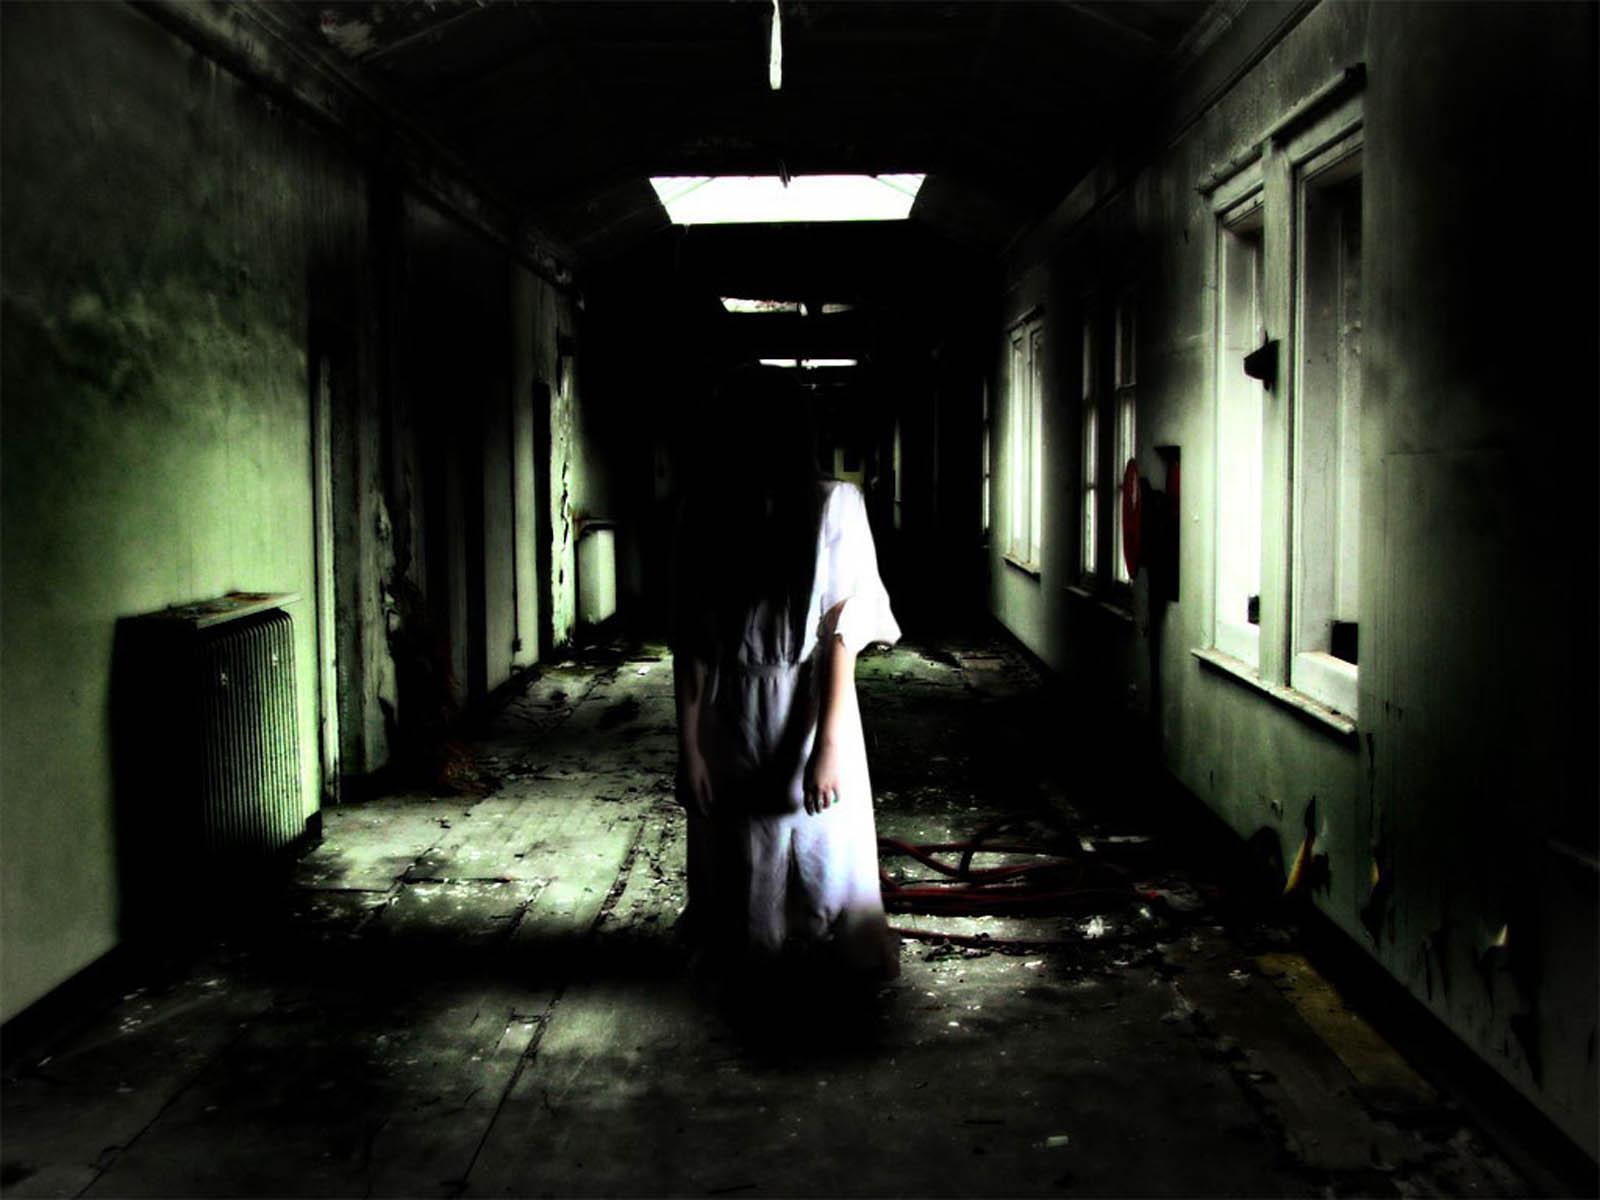 Scary horror wallpapers scary horror desktop wallpapers scary horror